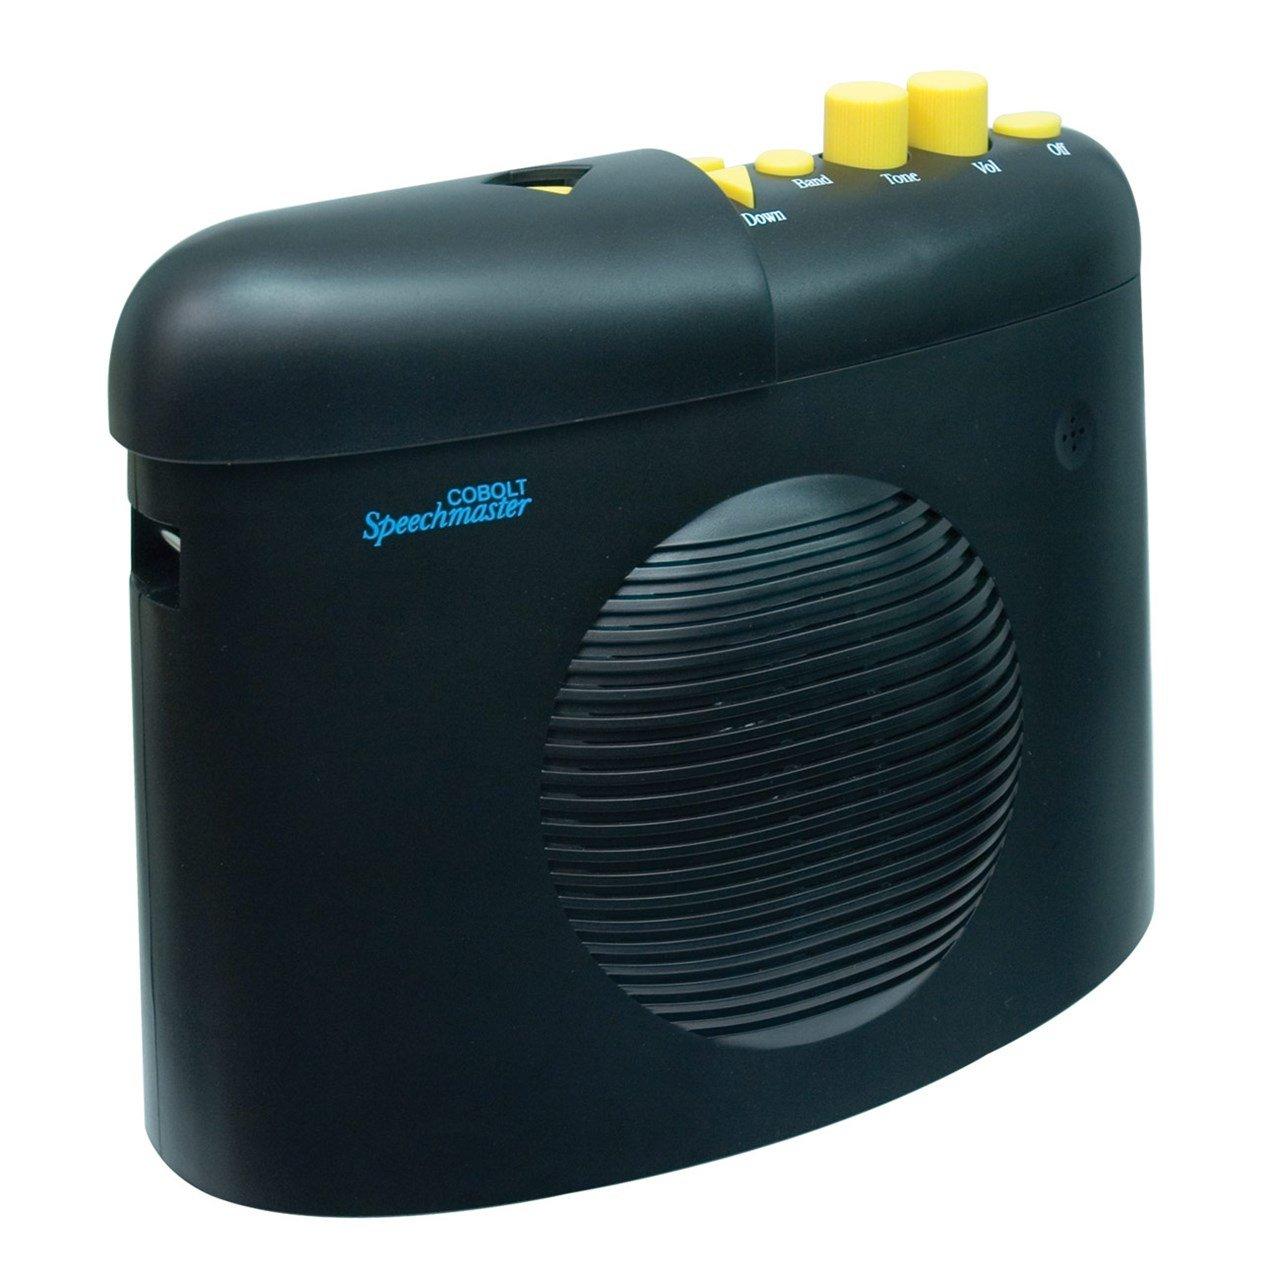 Speechmaster Talking Portable Multi-Function FM Clock Radio